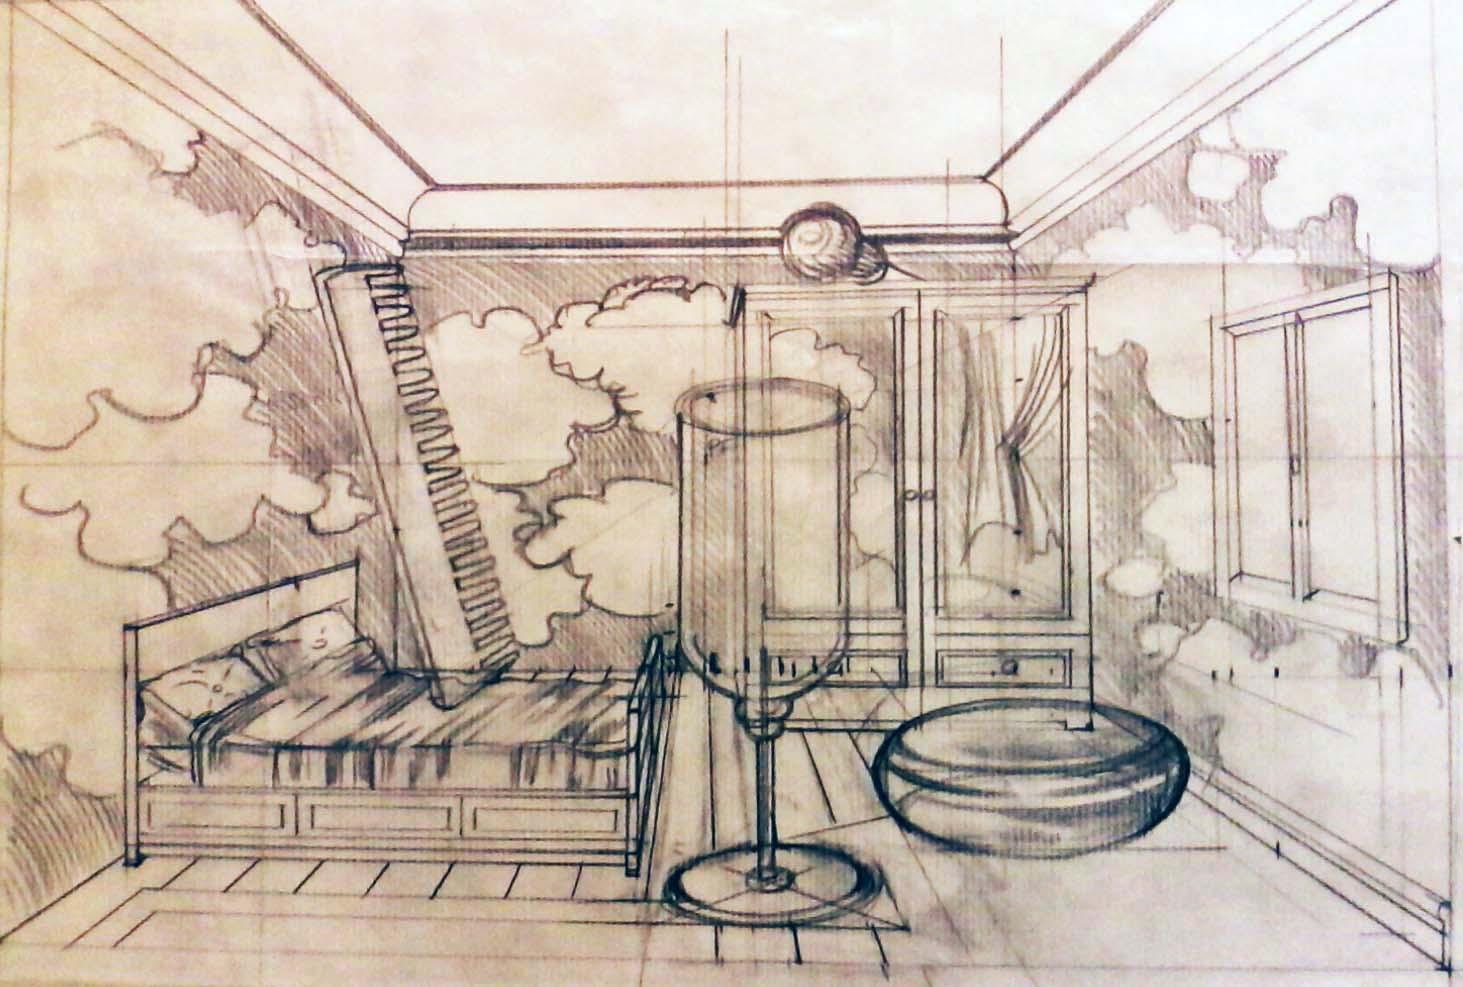 dessin en perspective - copie Magritte